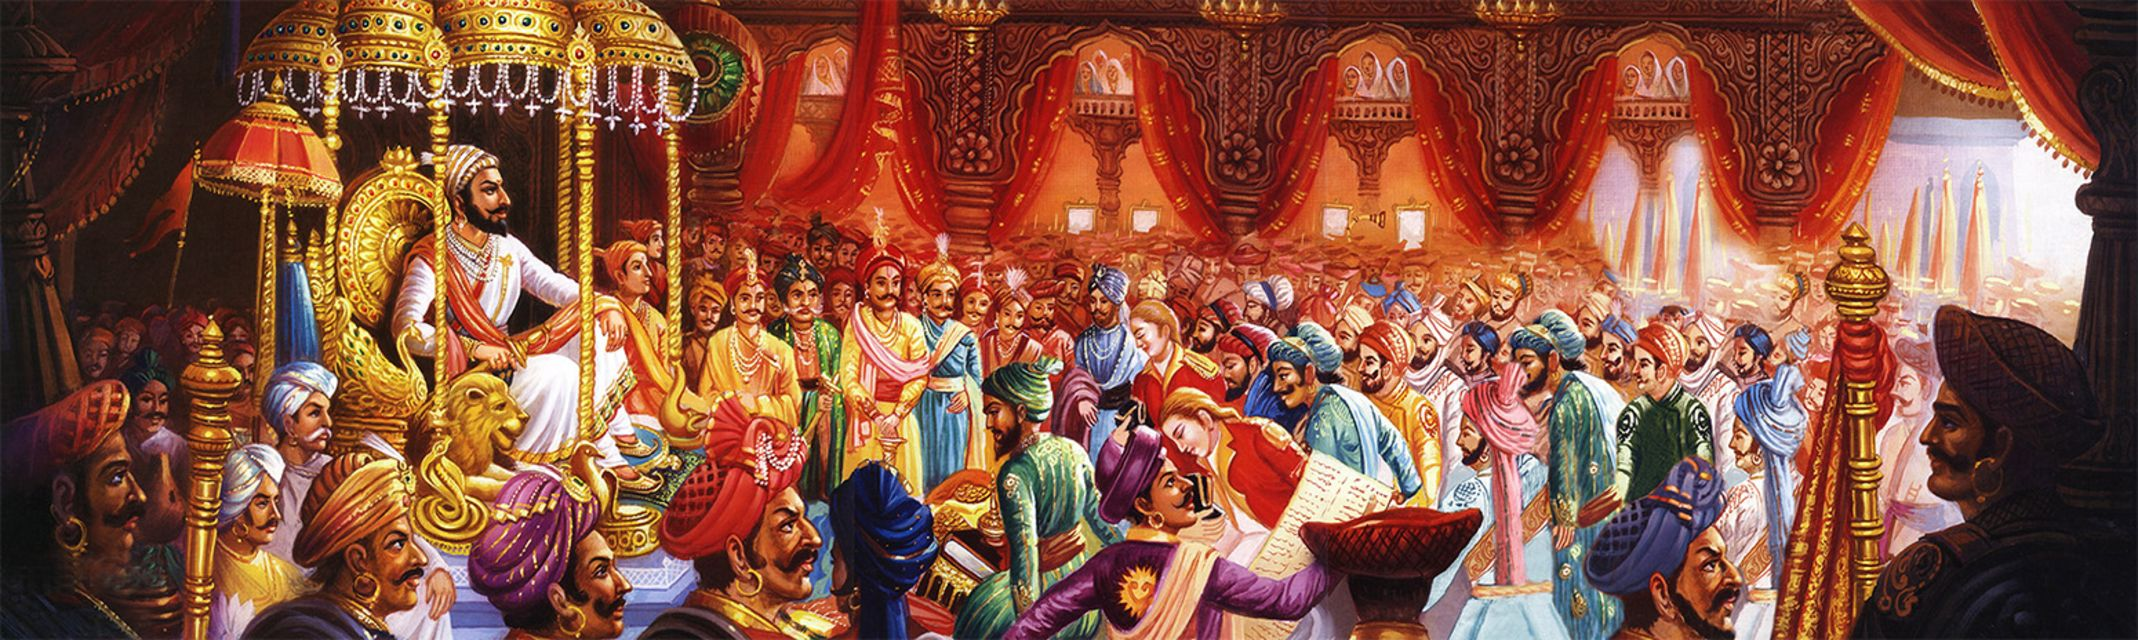 Hd Wallpapers Of Shivaji Maharaj Rajyabhishek Vinnyoleo Vegetal